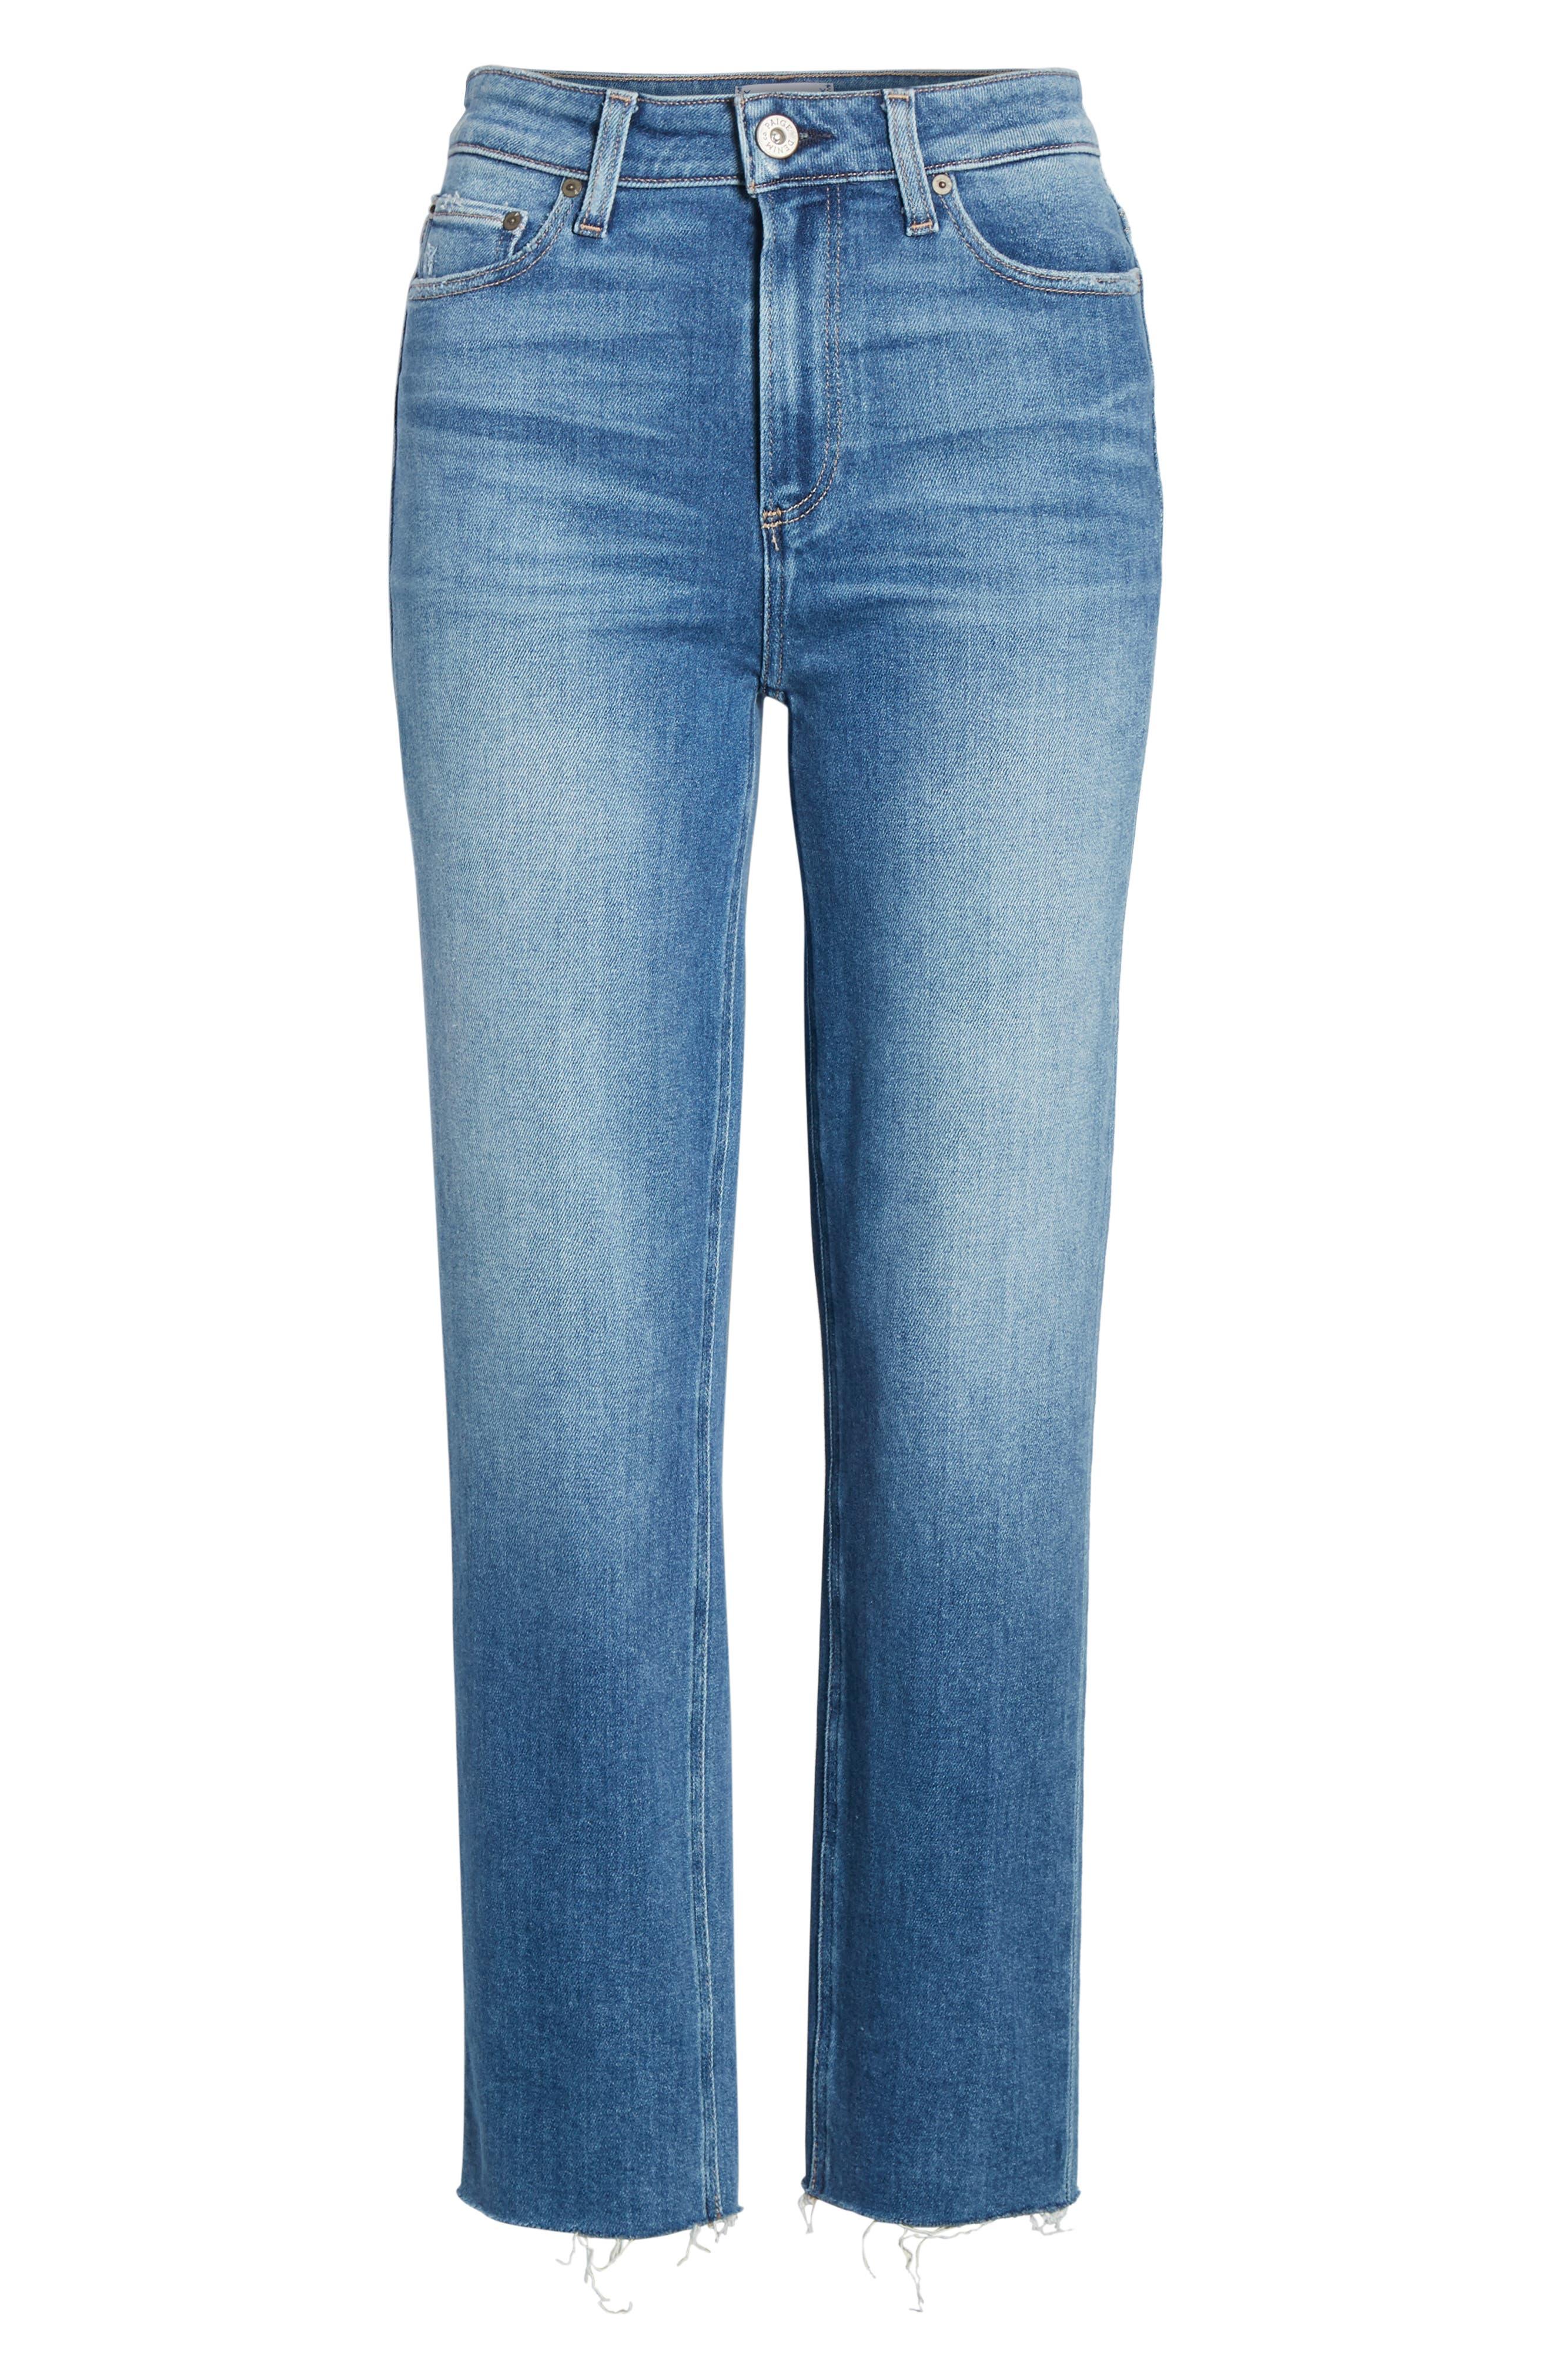 Vintage - Hoxton High Waist Raw Hem Straight Leg Jeans,                             Alternate thumbnail 6, color,                             RENZO DISTRESSED